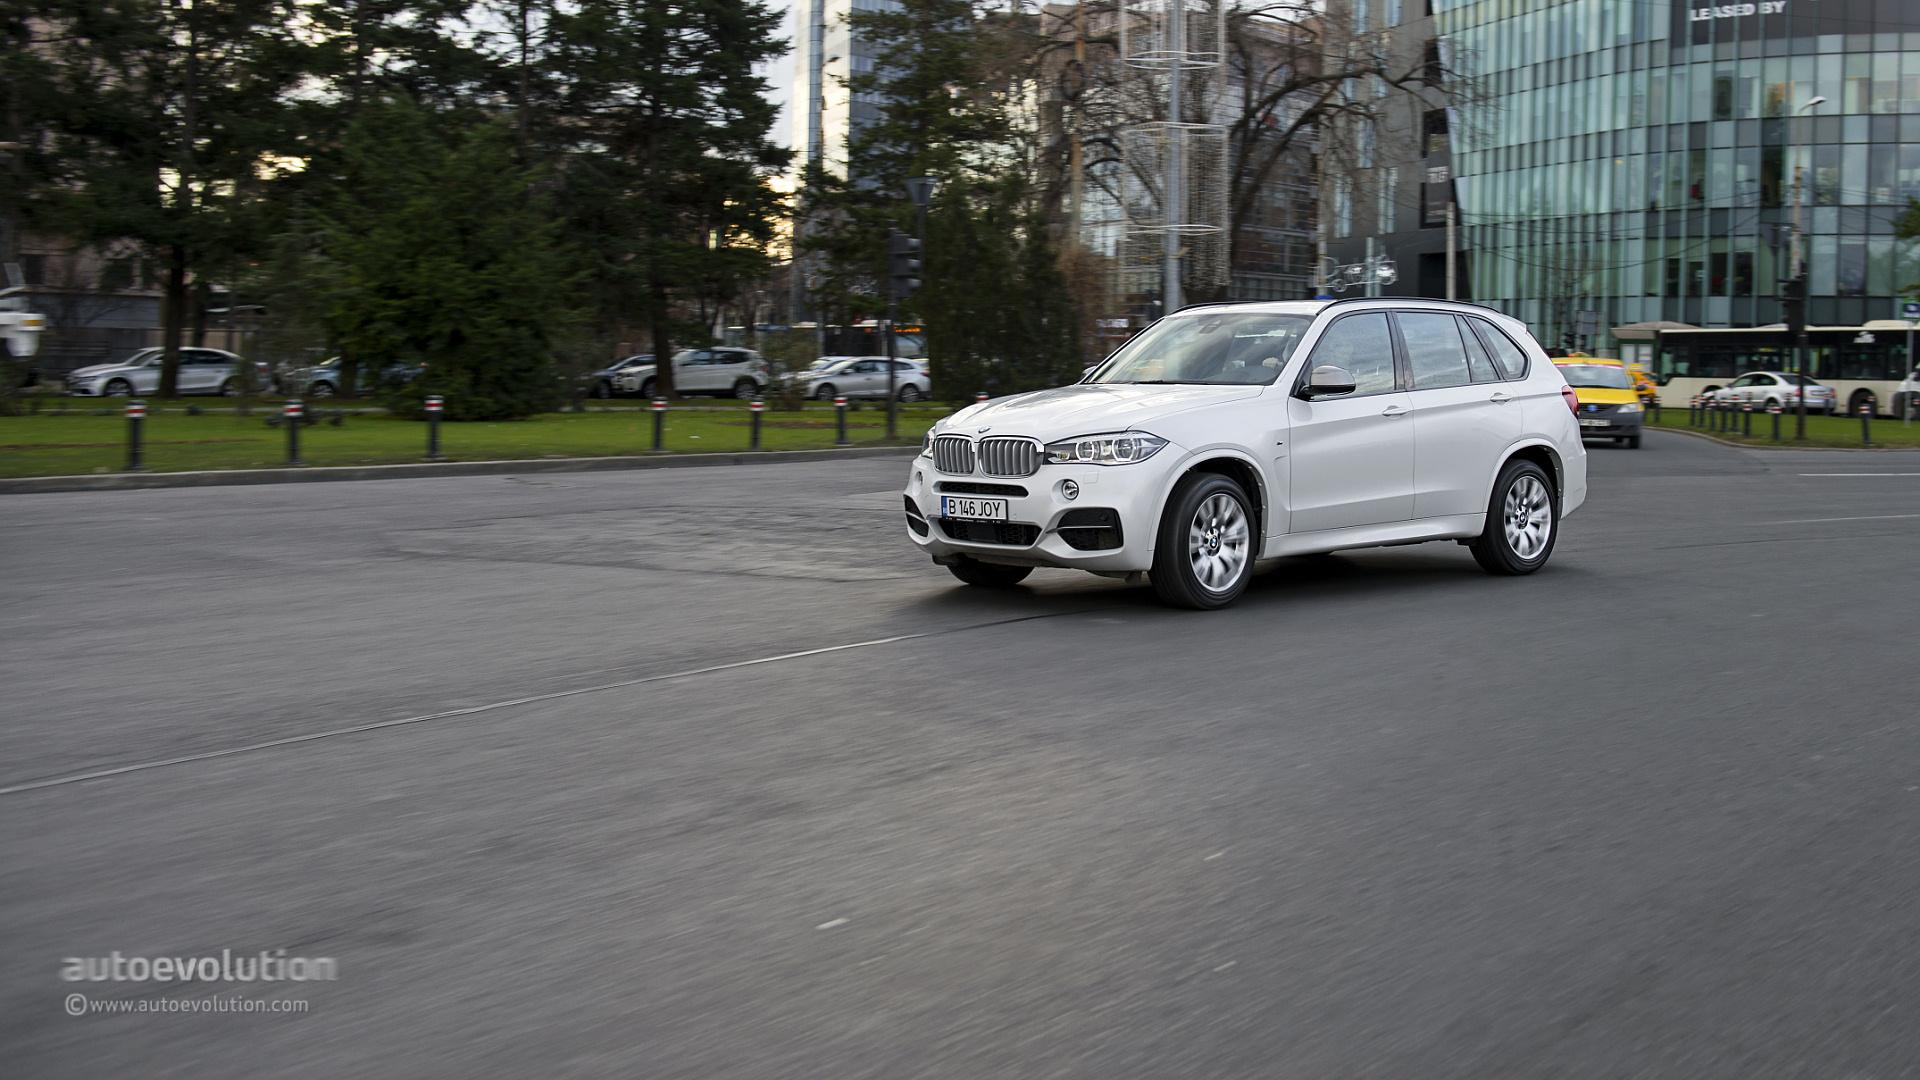 new car release dates uk 2014New Bmw X5 Release Date Uk  CFA Vauban du Btiment